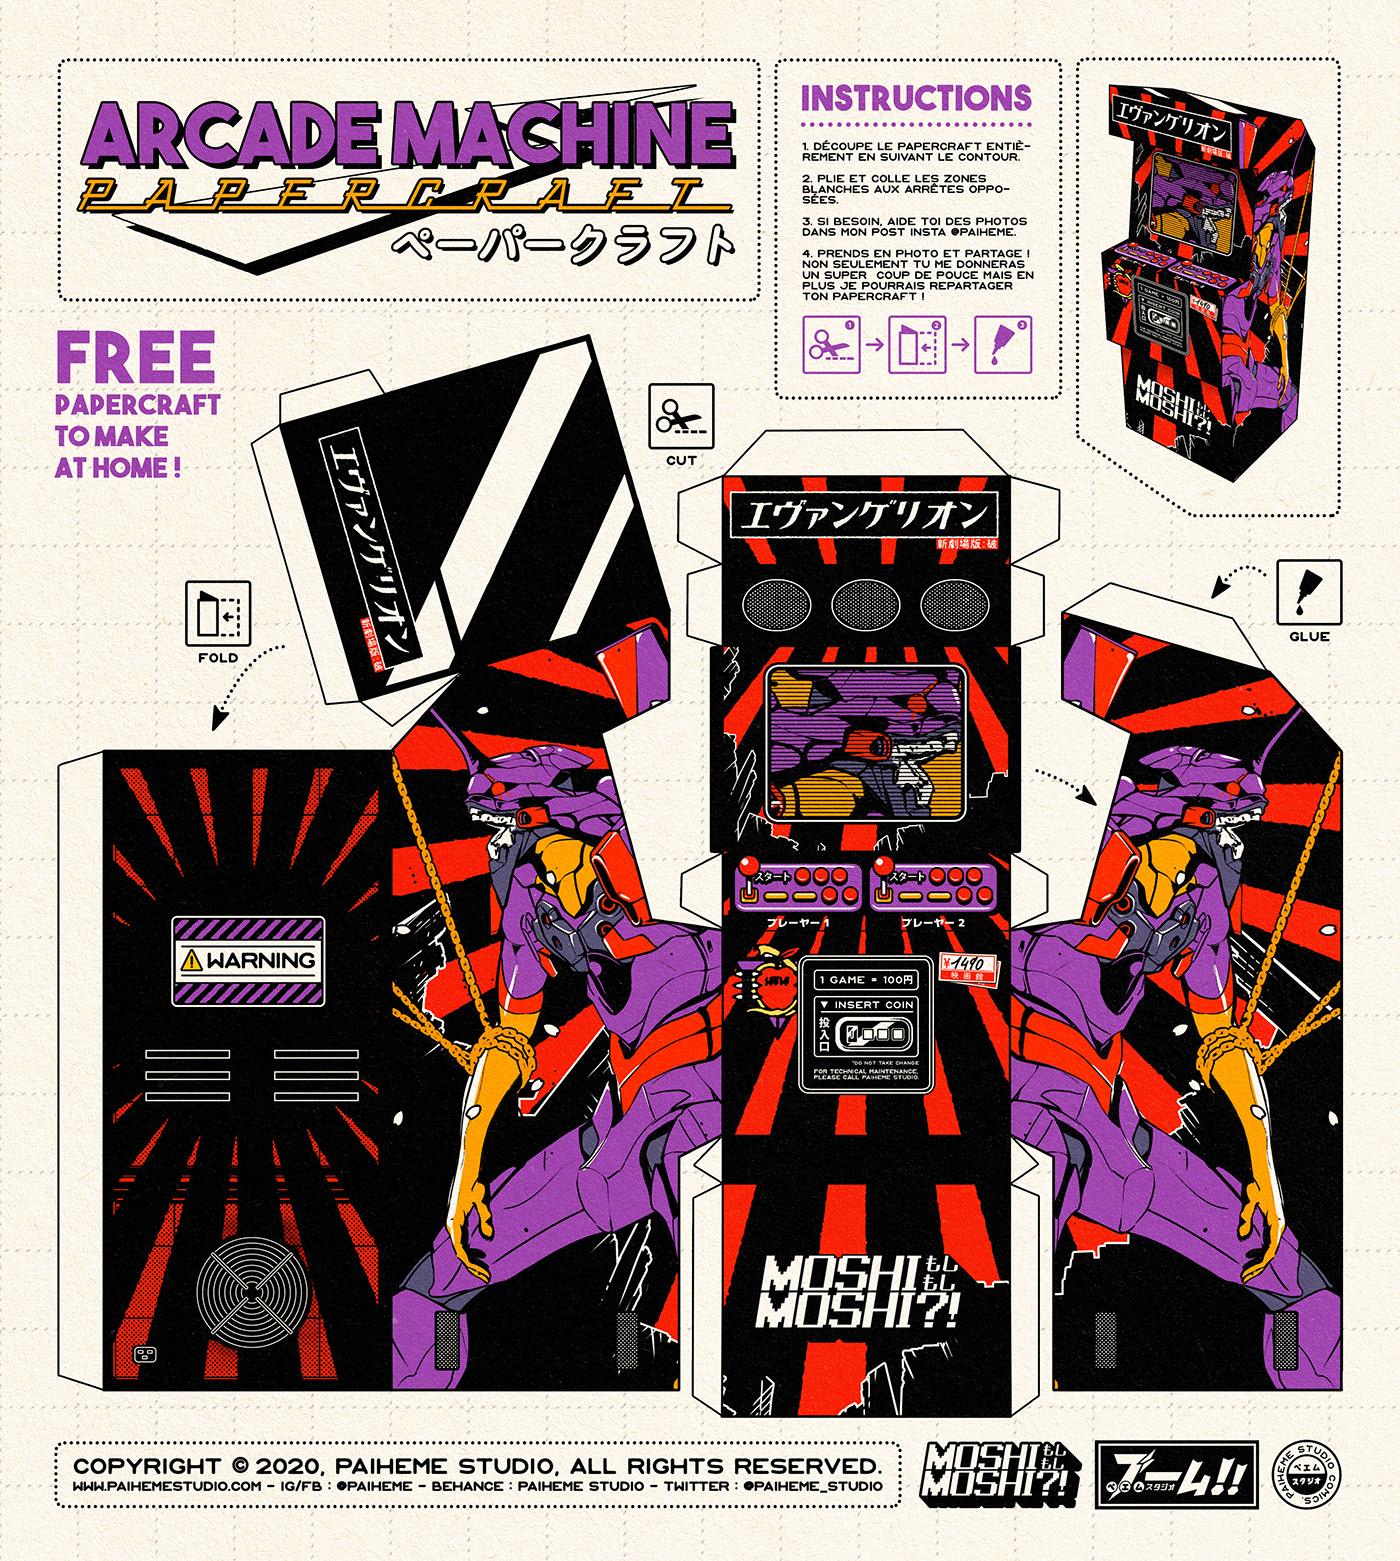 arcade,download,free,machine,paiheme,paihemestudio,papercraft,Retro,retrogaming,vintage